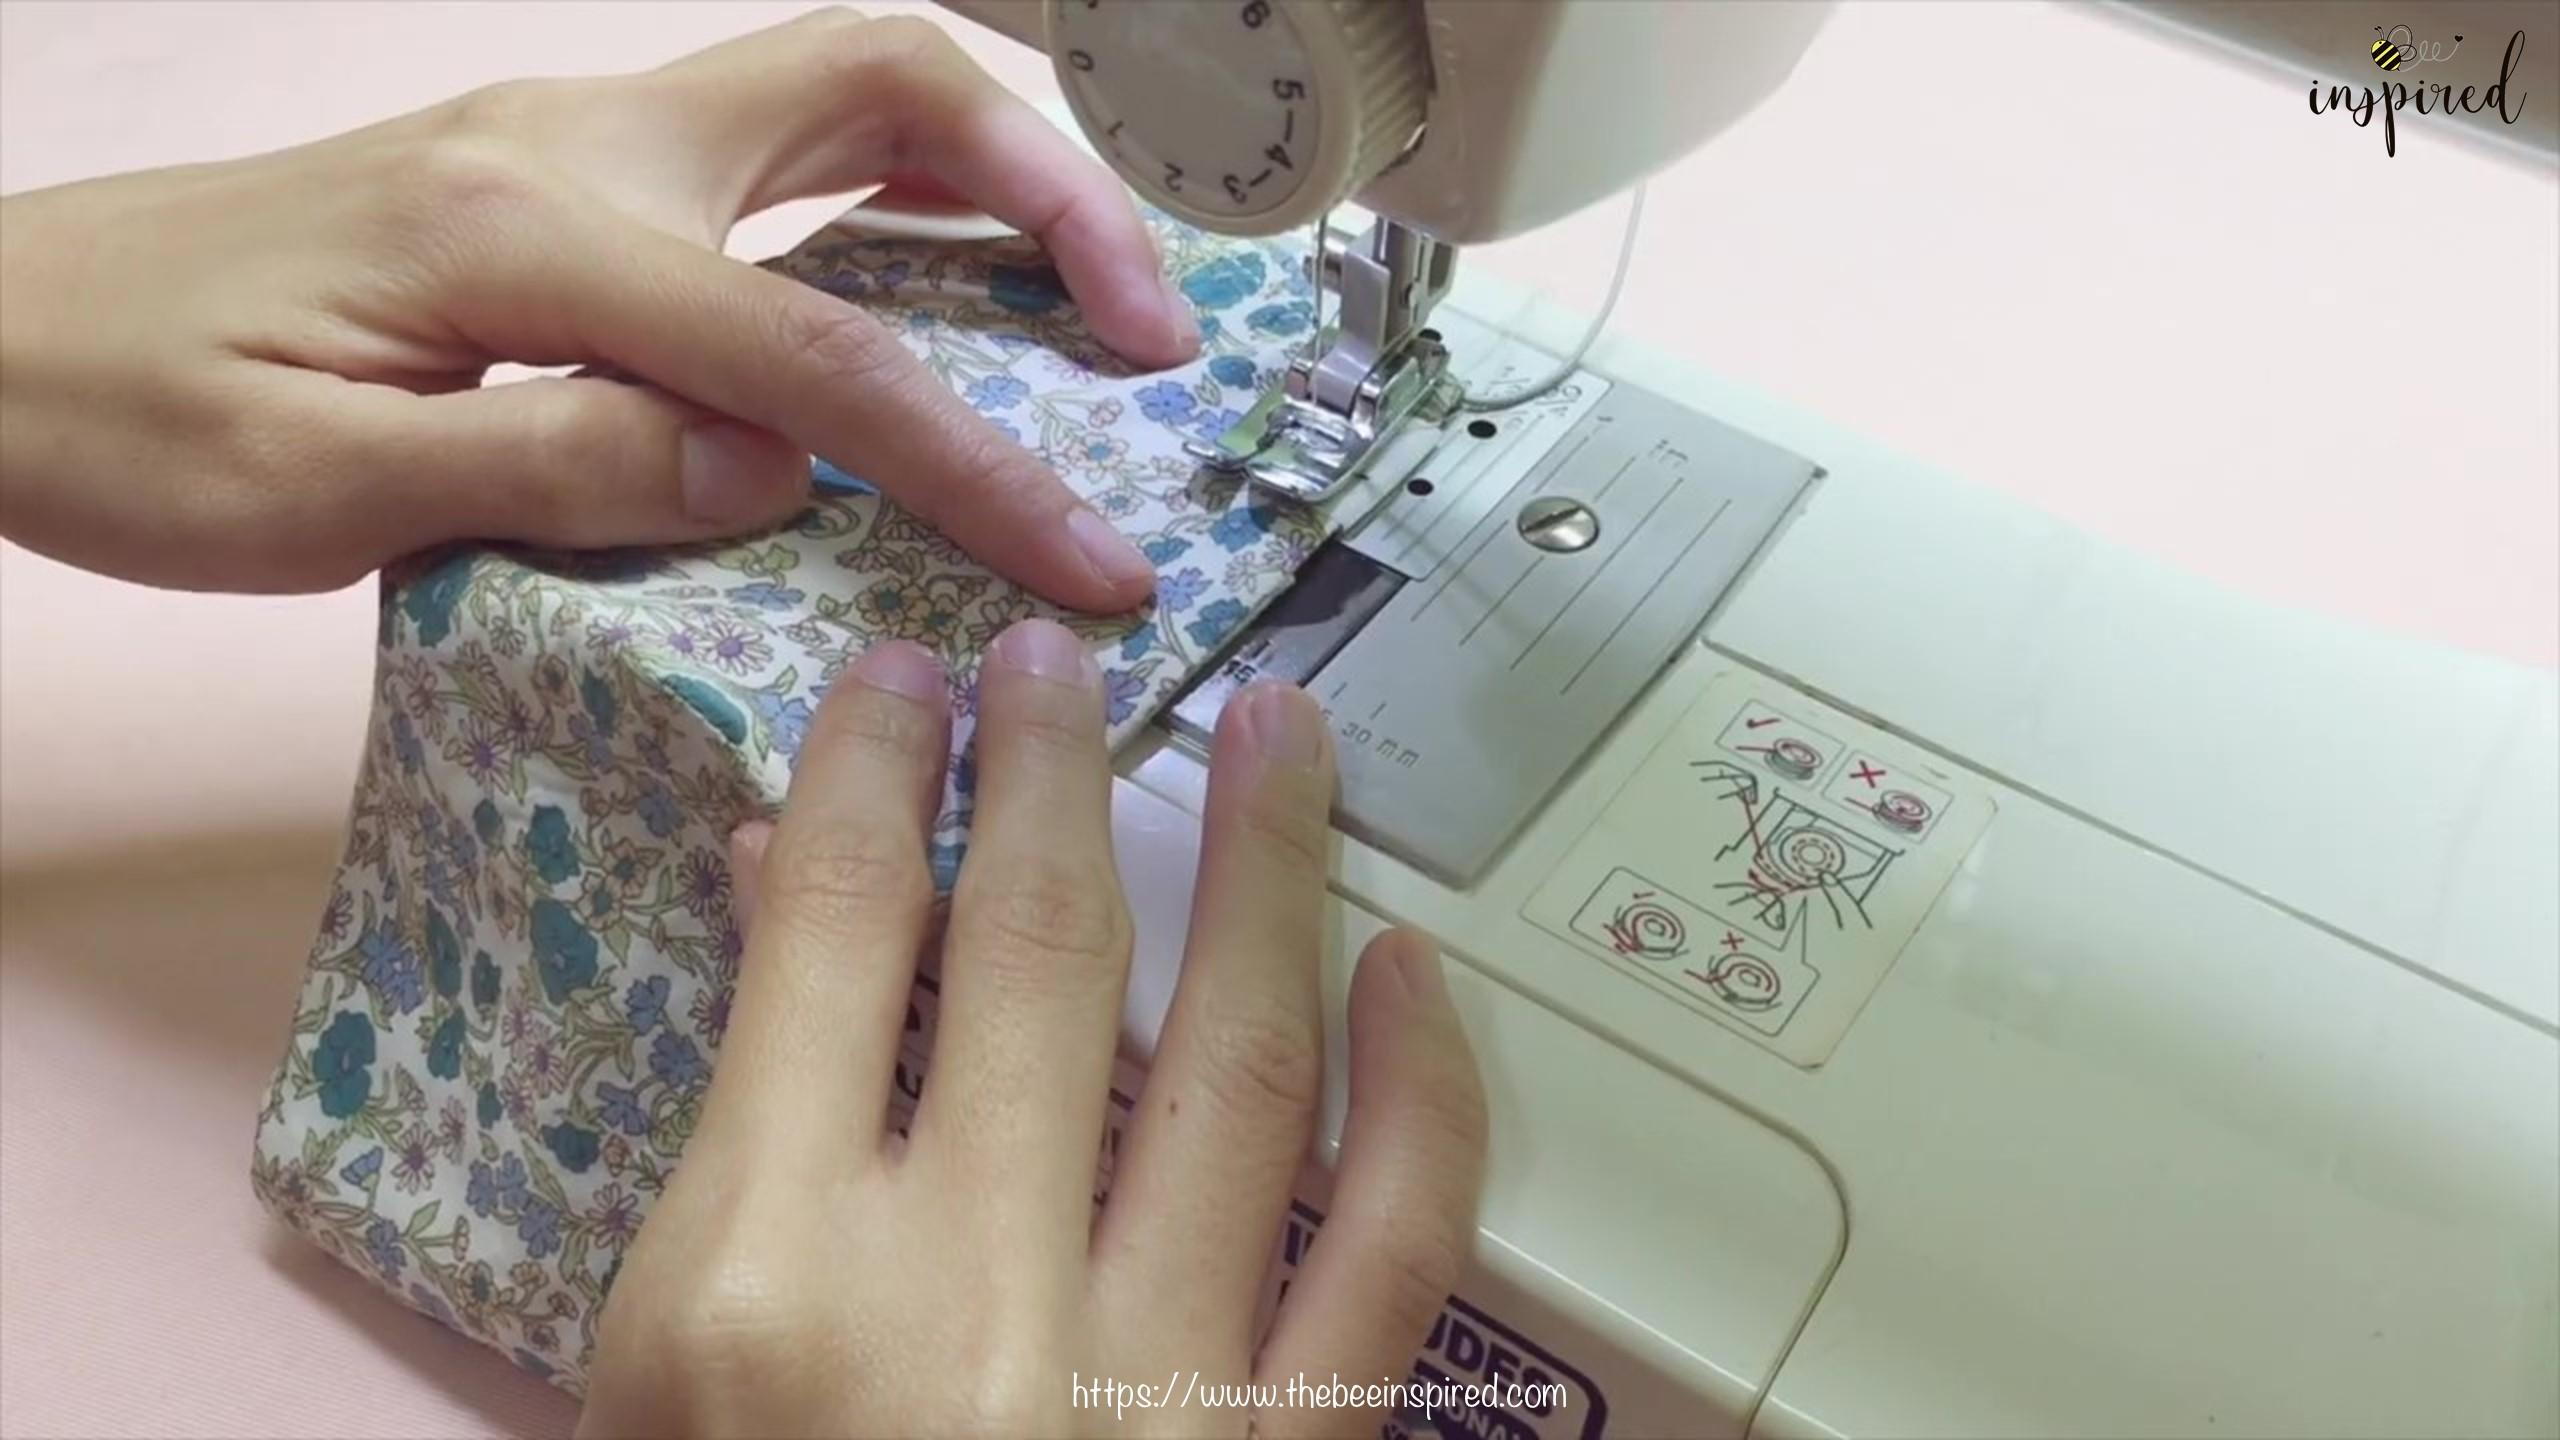 DIY 5 วิธีทำป้ายโลโก้แบรนด์ตัวเองที่บ้านแบบง่ายๆ I How to Make Your Own Fabric Labels at Home_28